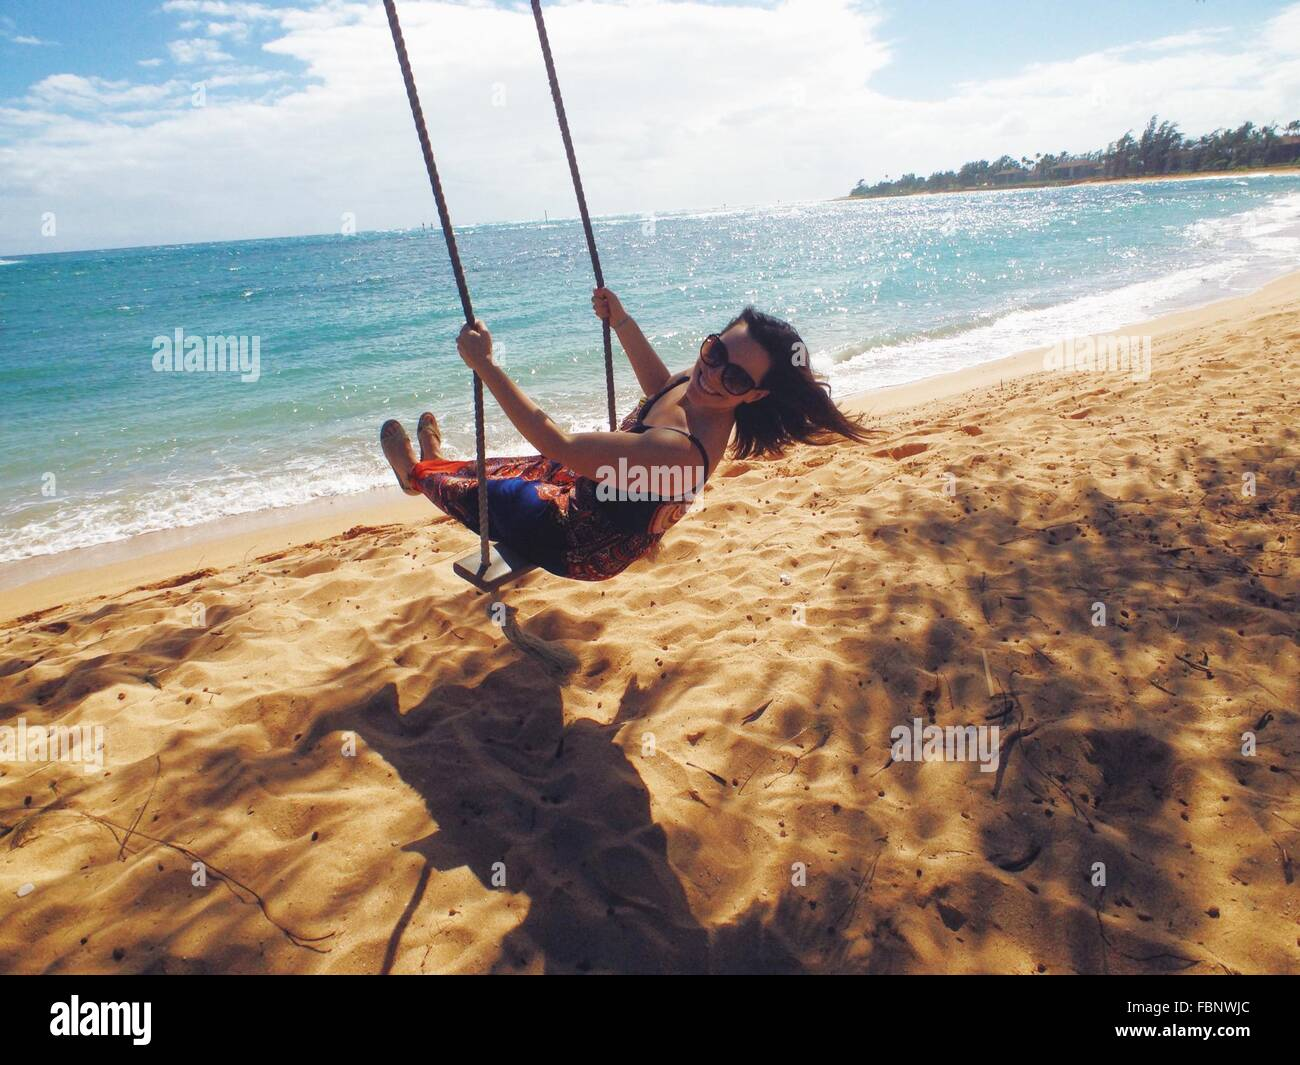 Woman On Beach Swing - Stock Image